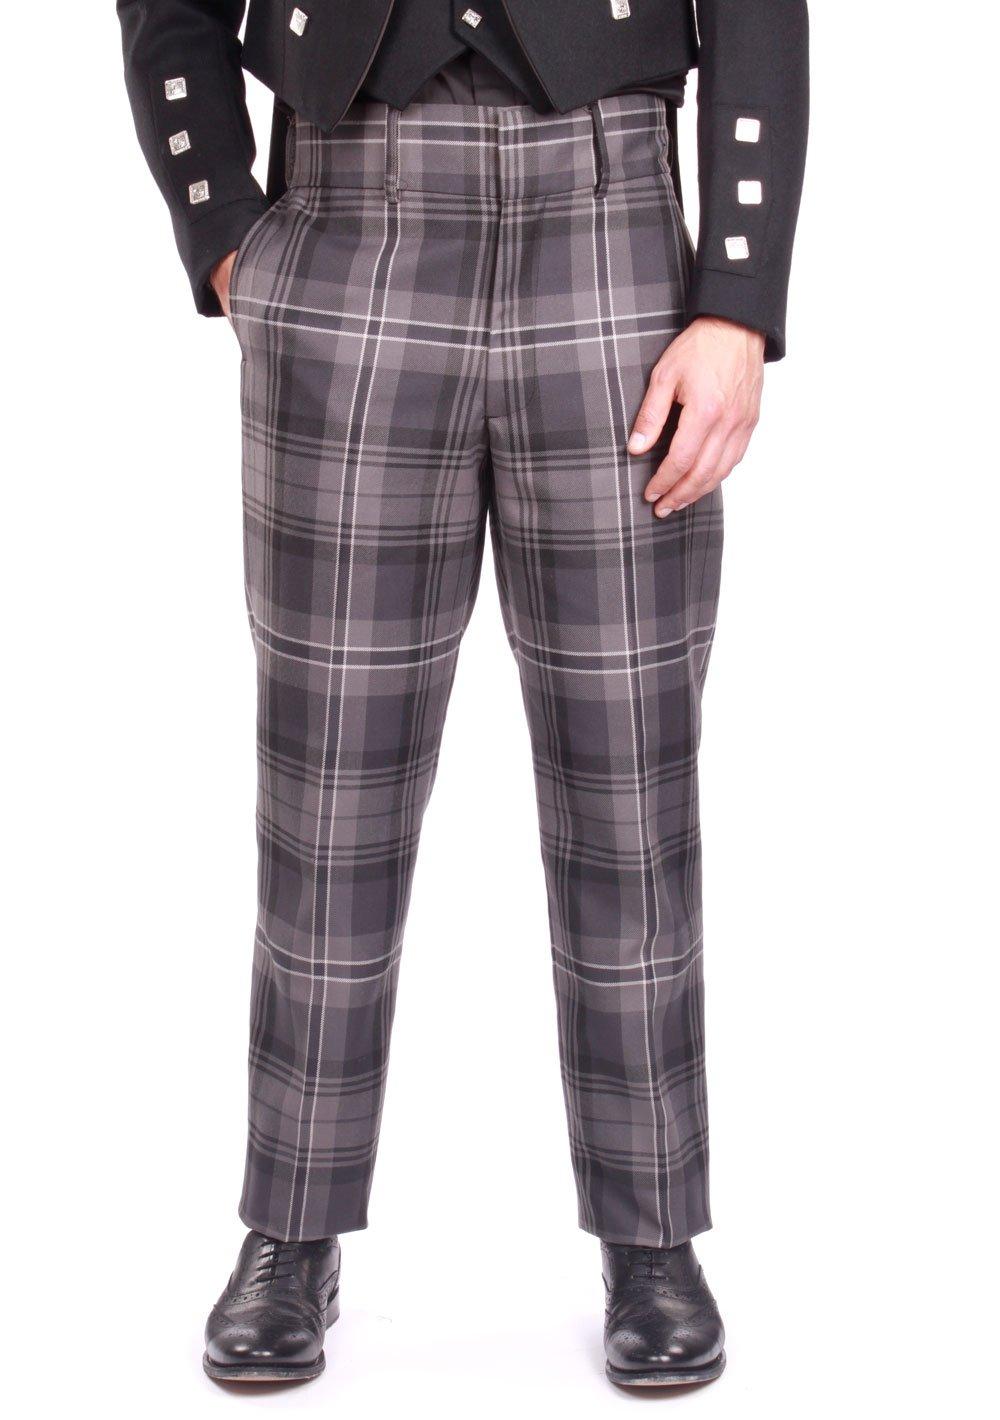 Kilt Society Mens Essentials Scottish Hamilton Grey Tartan Trousers Trews 44 Long